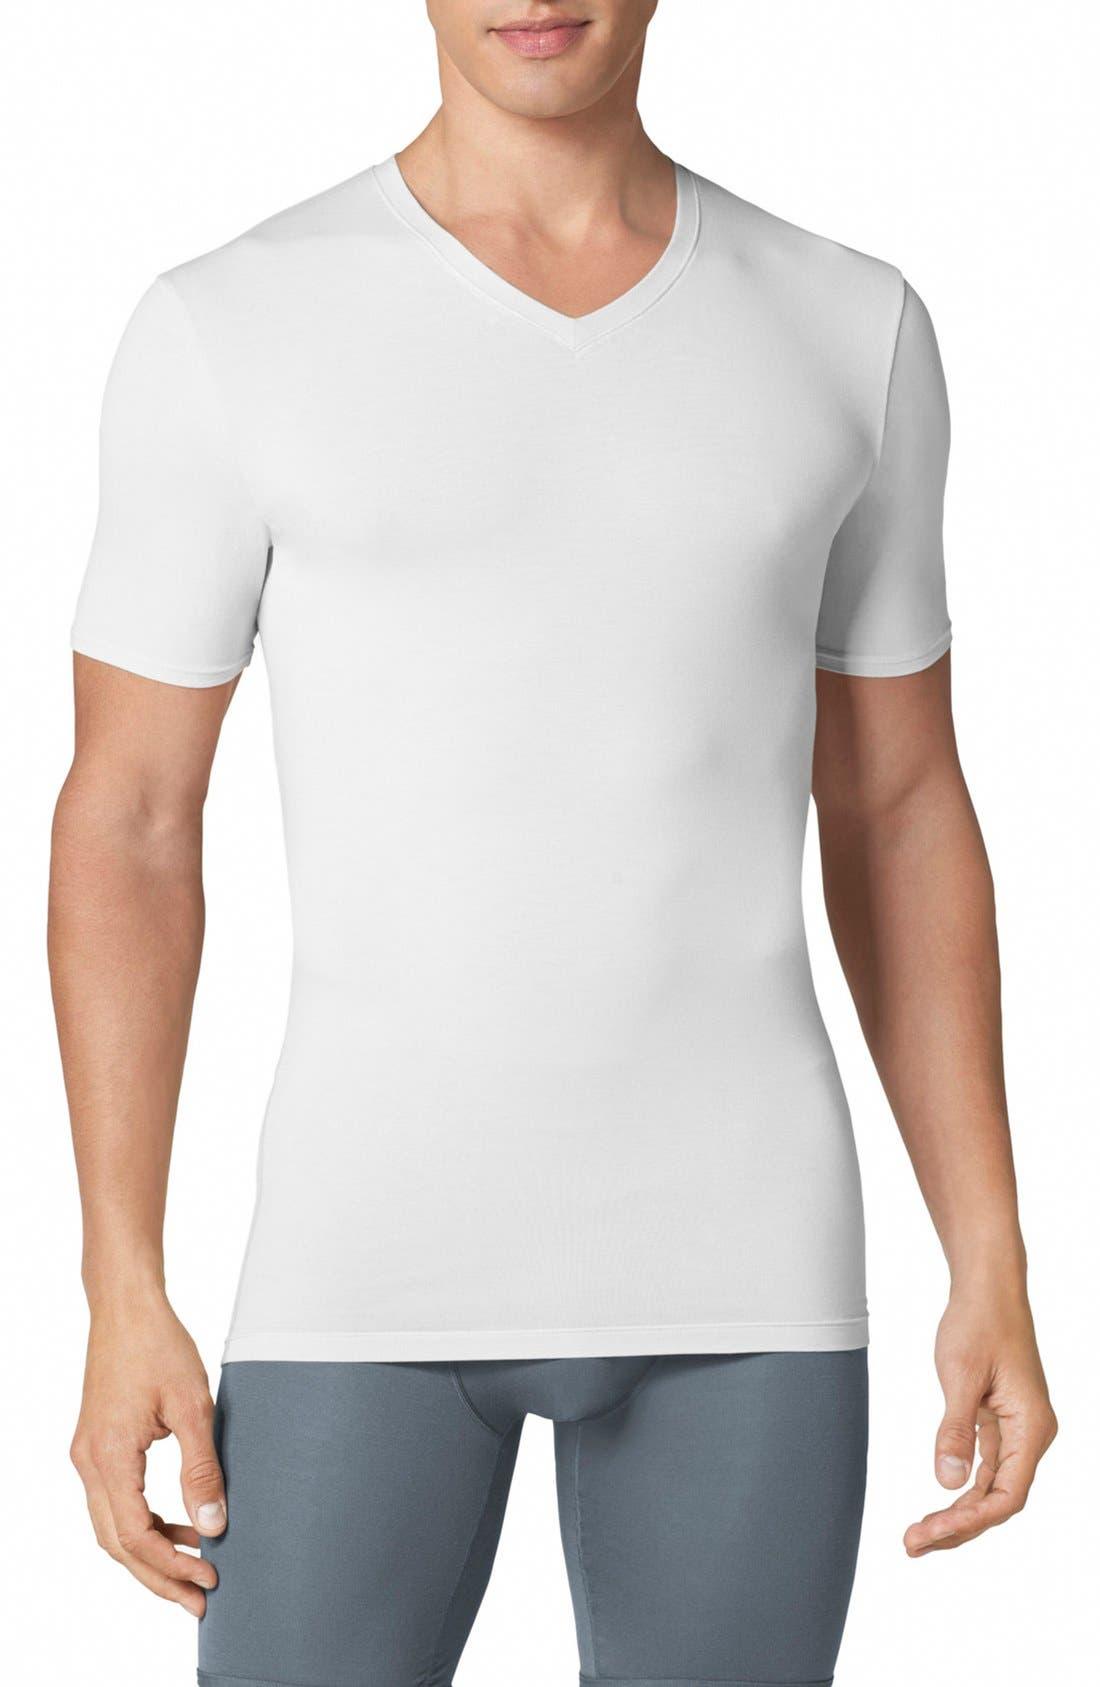 Main Image - Tommy John 'Second Skin' High V-Neck Undershirt